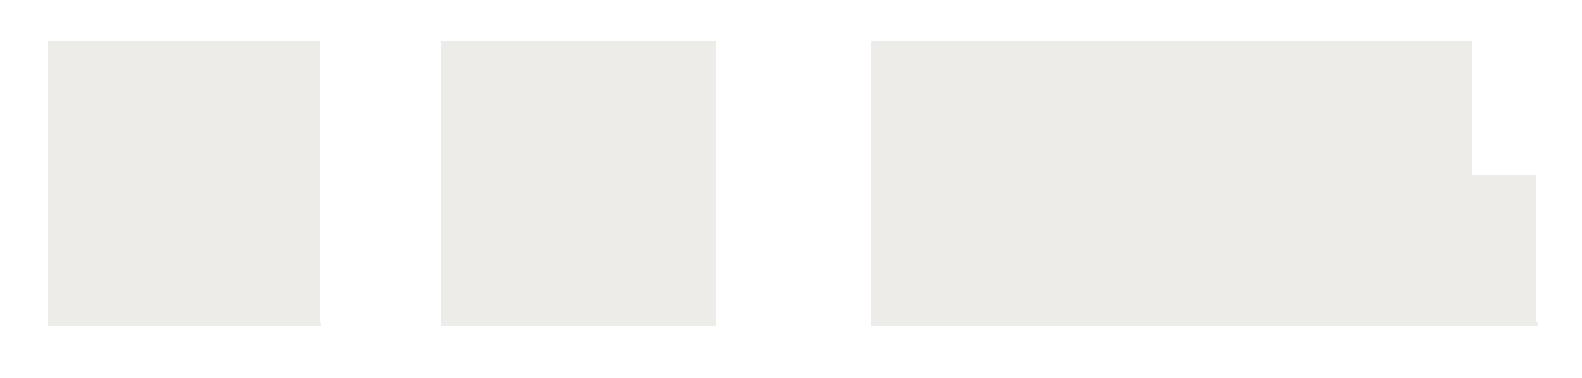 ANNATXT